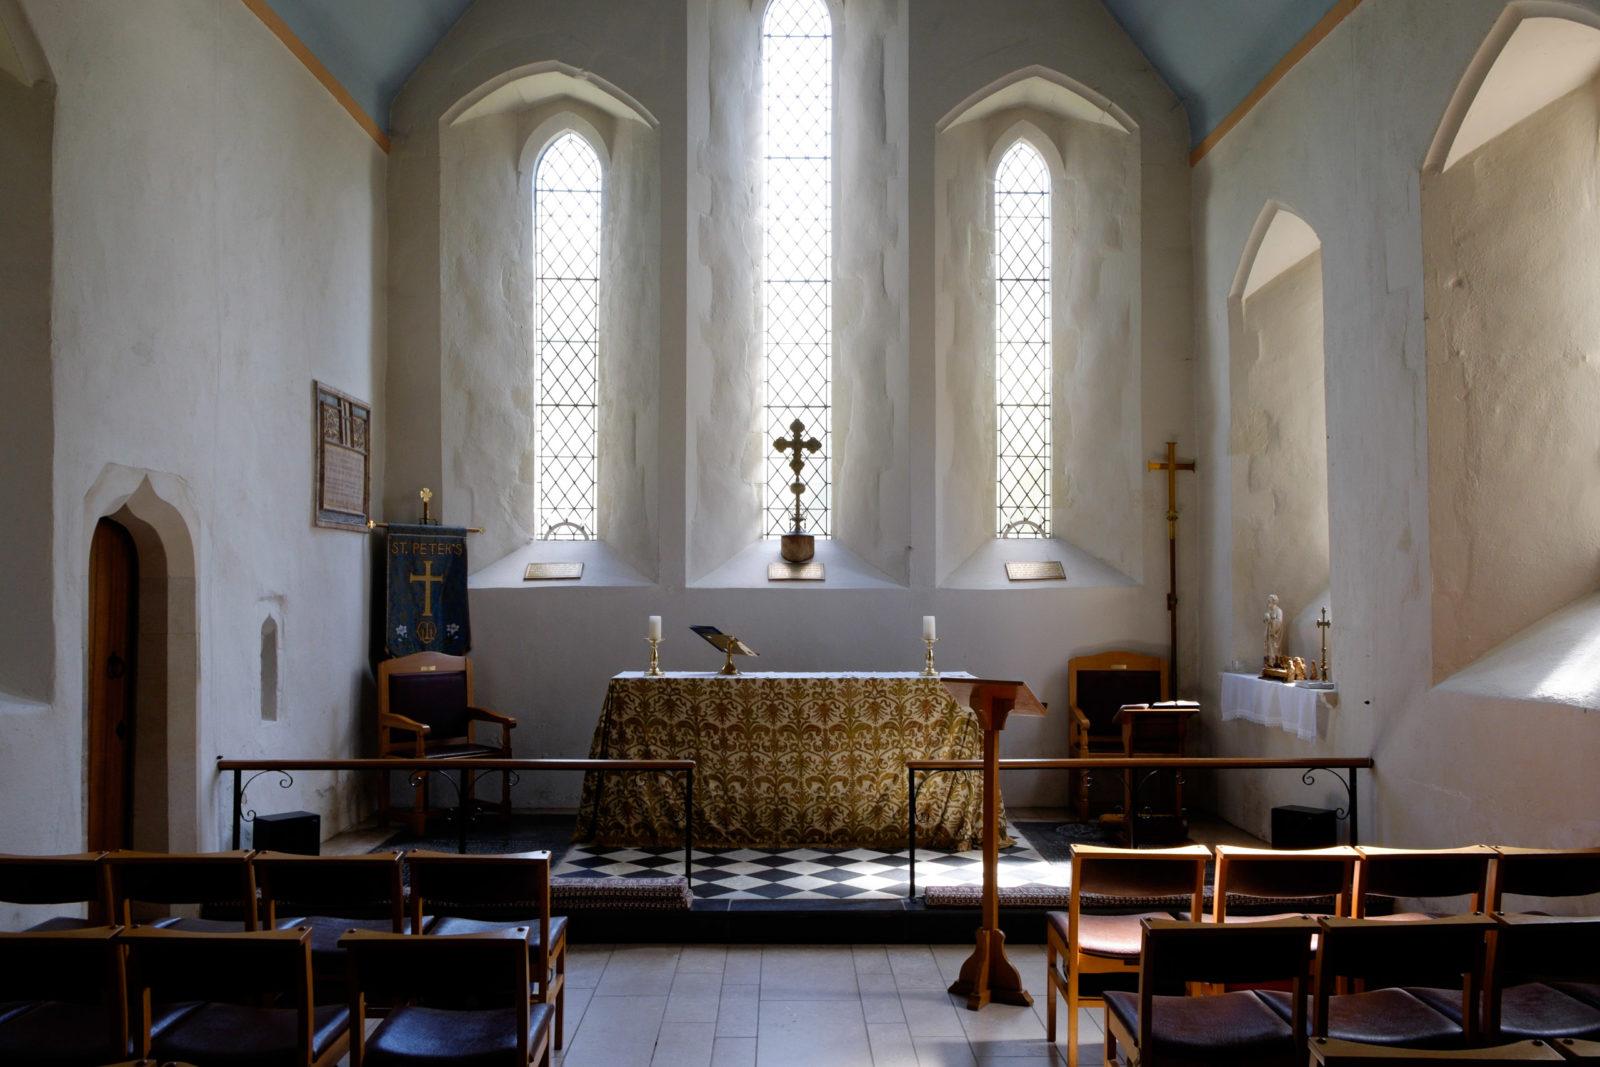 St. Peter, Yateley